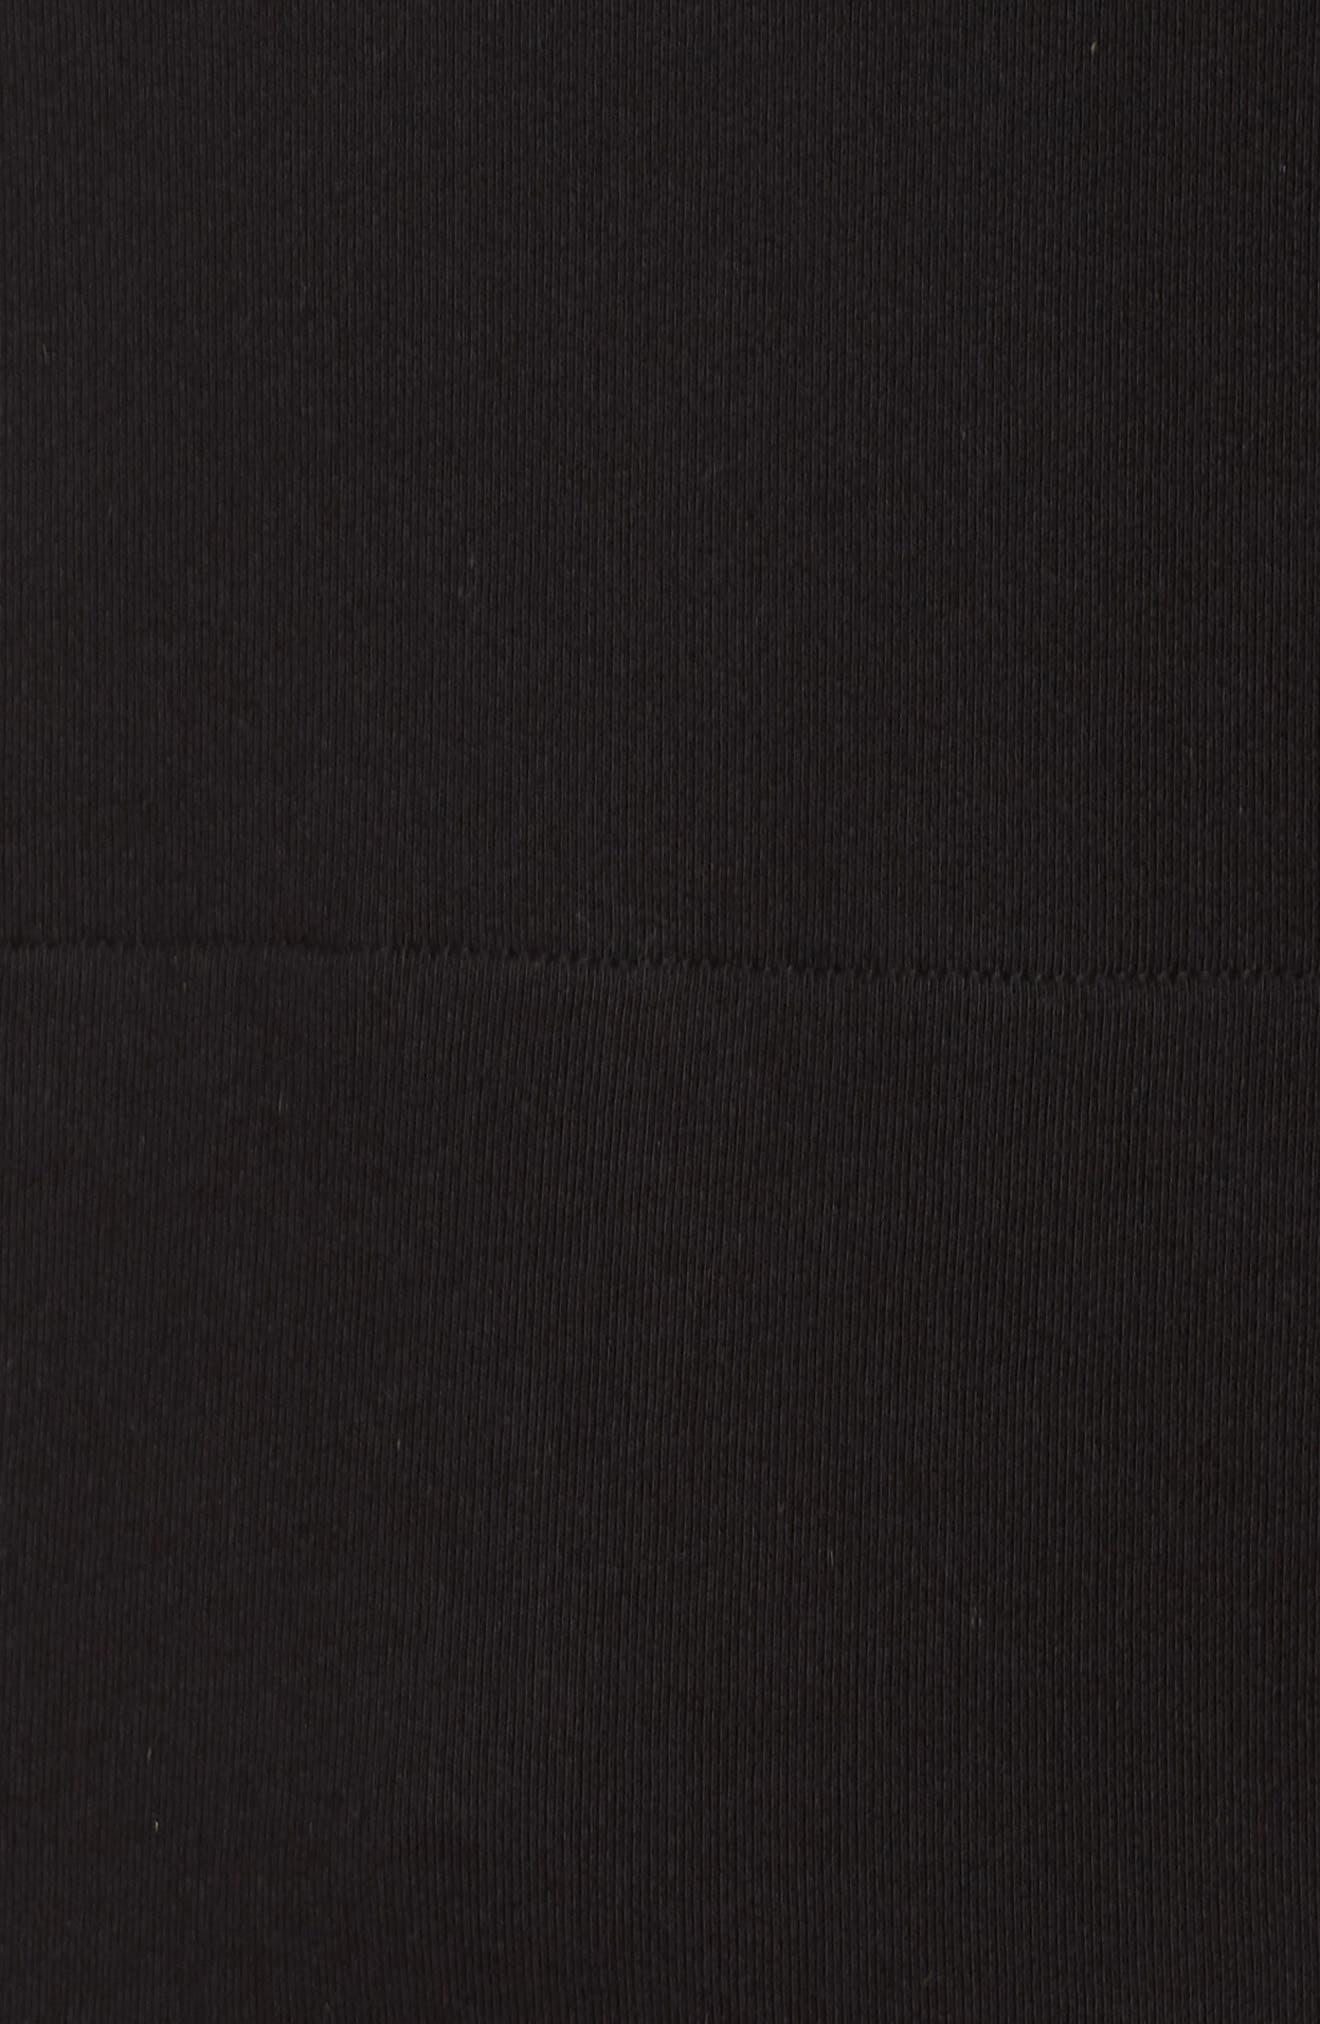 Shift Hoodie Sweatshirt,                             Alternate thumbnail 6, color,                             BLACK/ CHECKER